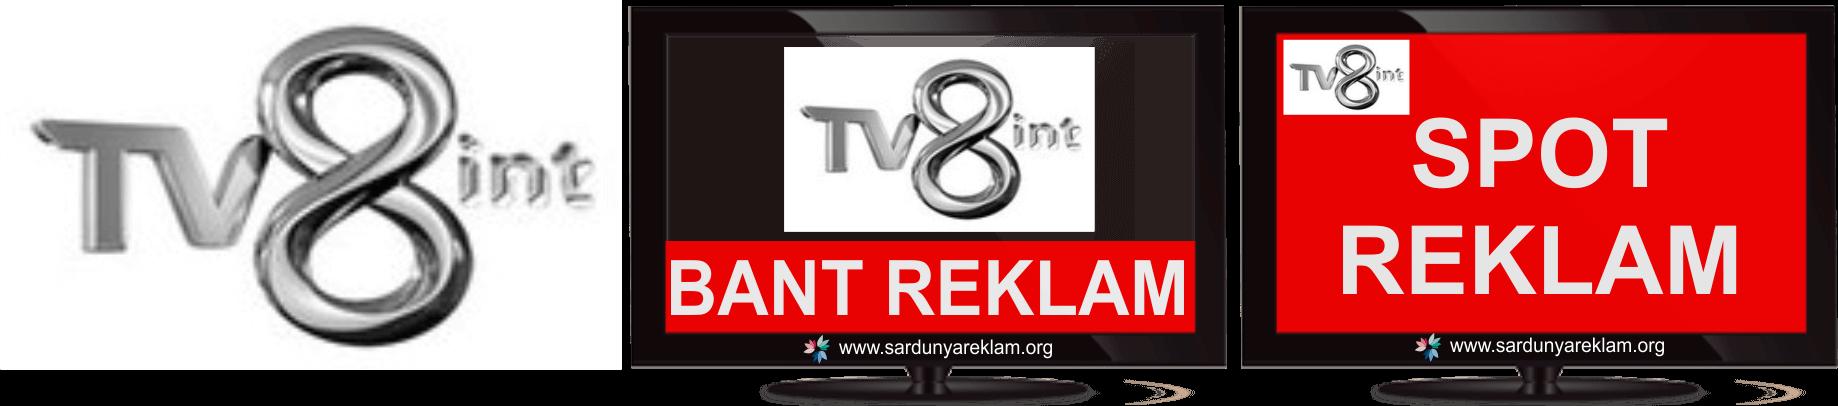 canli tv8 int